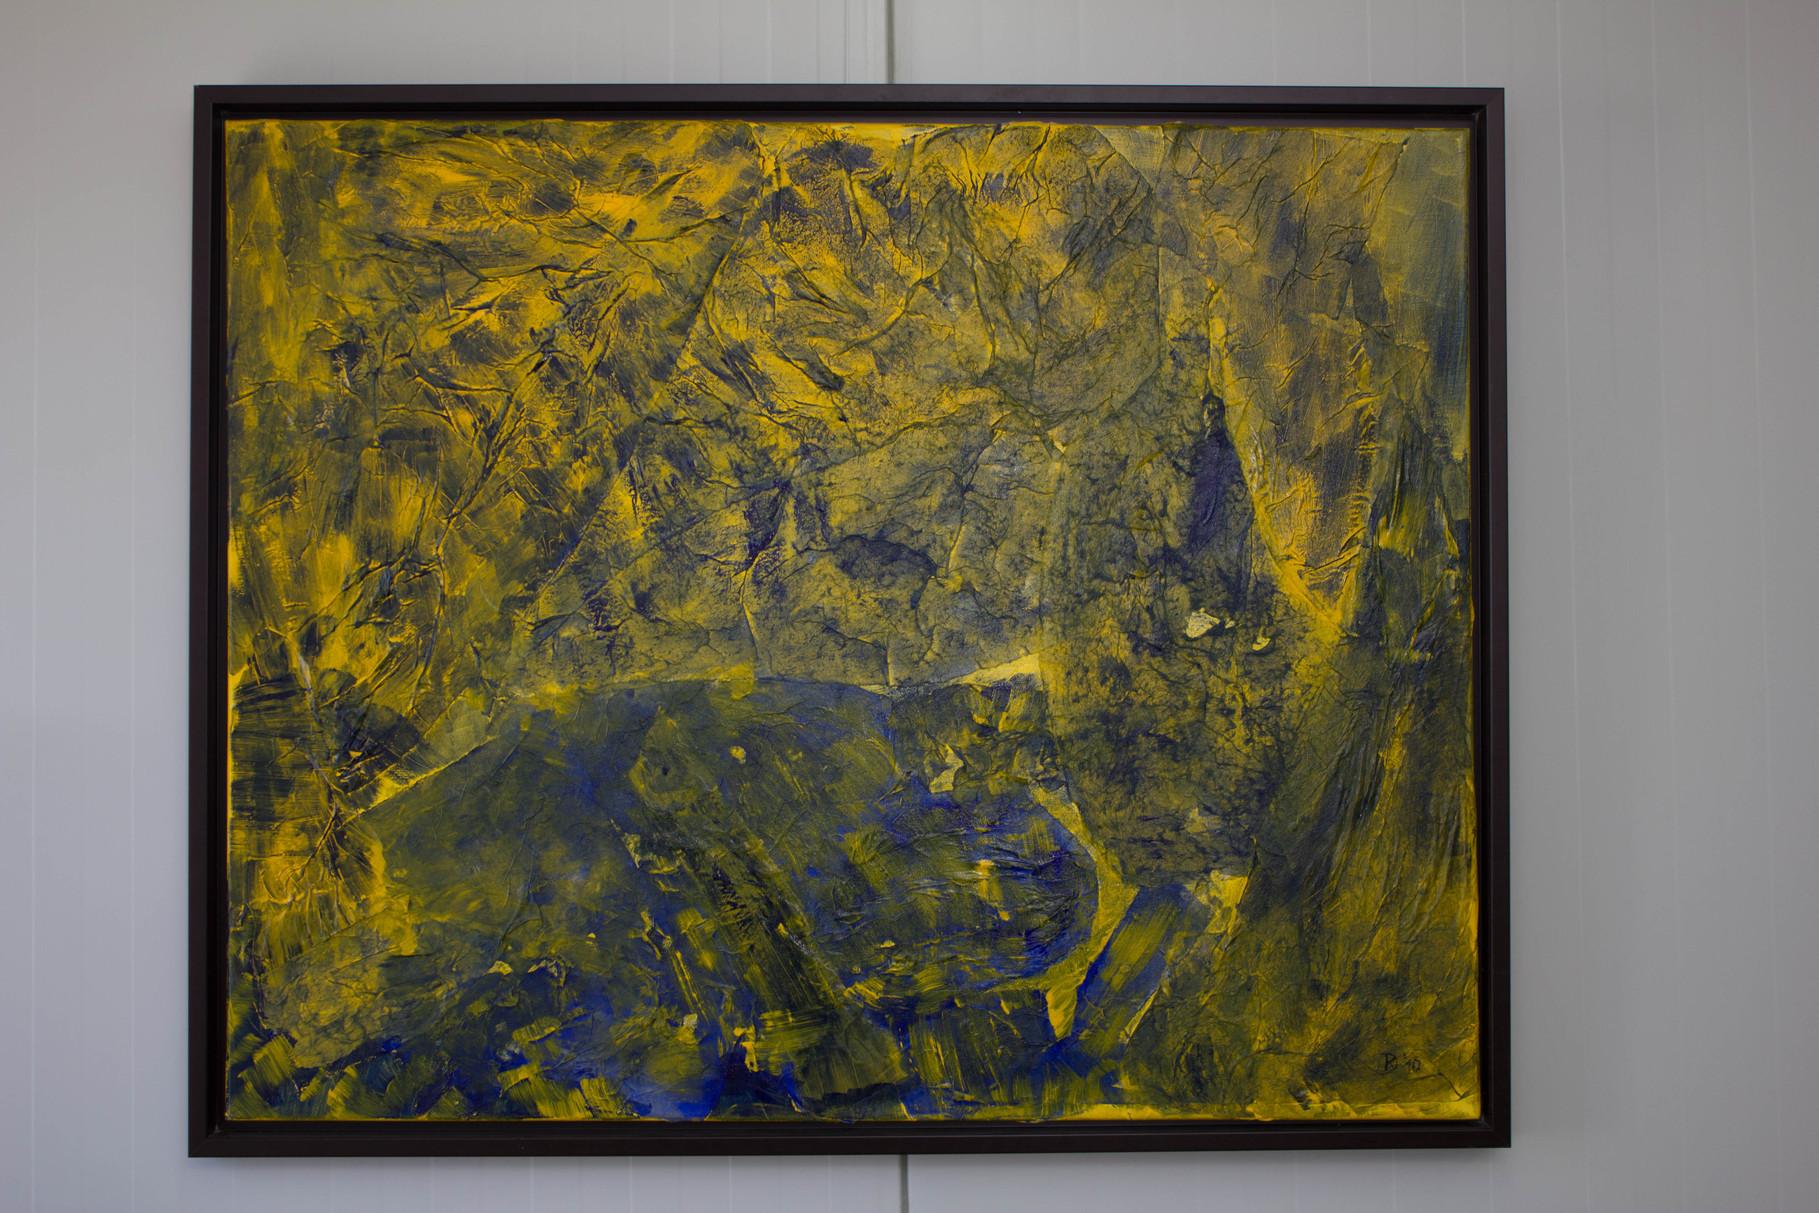 Nr. 36 Dietmar Krause, Acryl auf Japanpapier auf Leinwand, 100 x 120cm